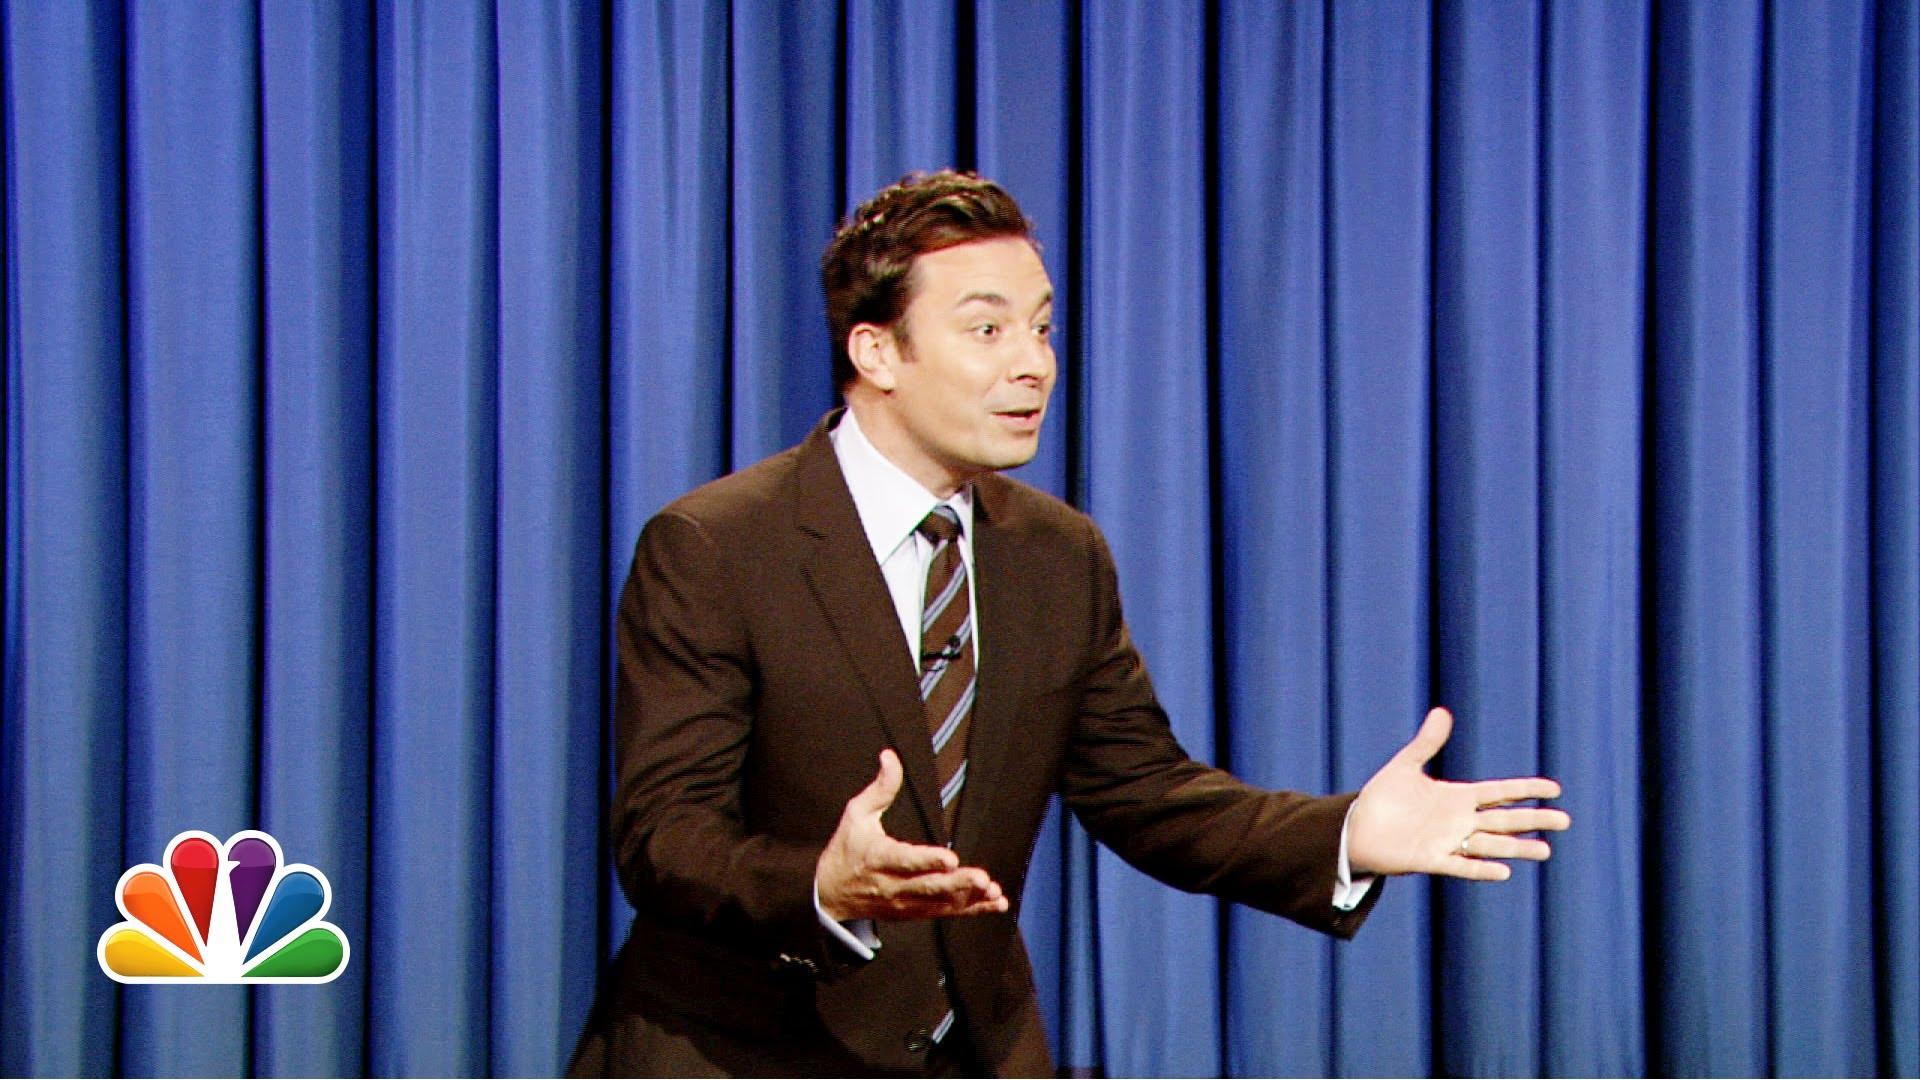 The Cast of 'Breaking Bad' Sings 'Bye Bye Bye' on 'Late Night With Jimmy Fallon'